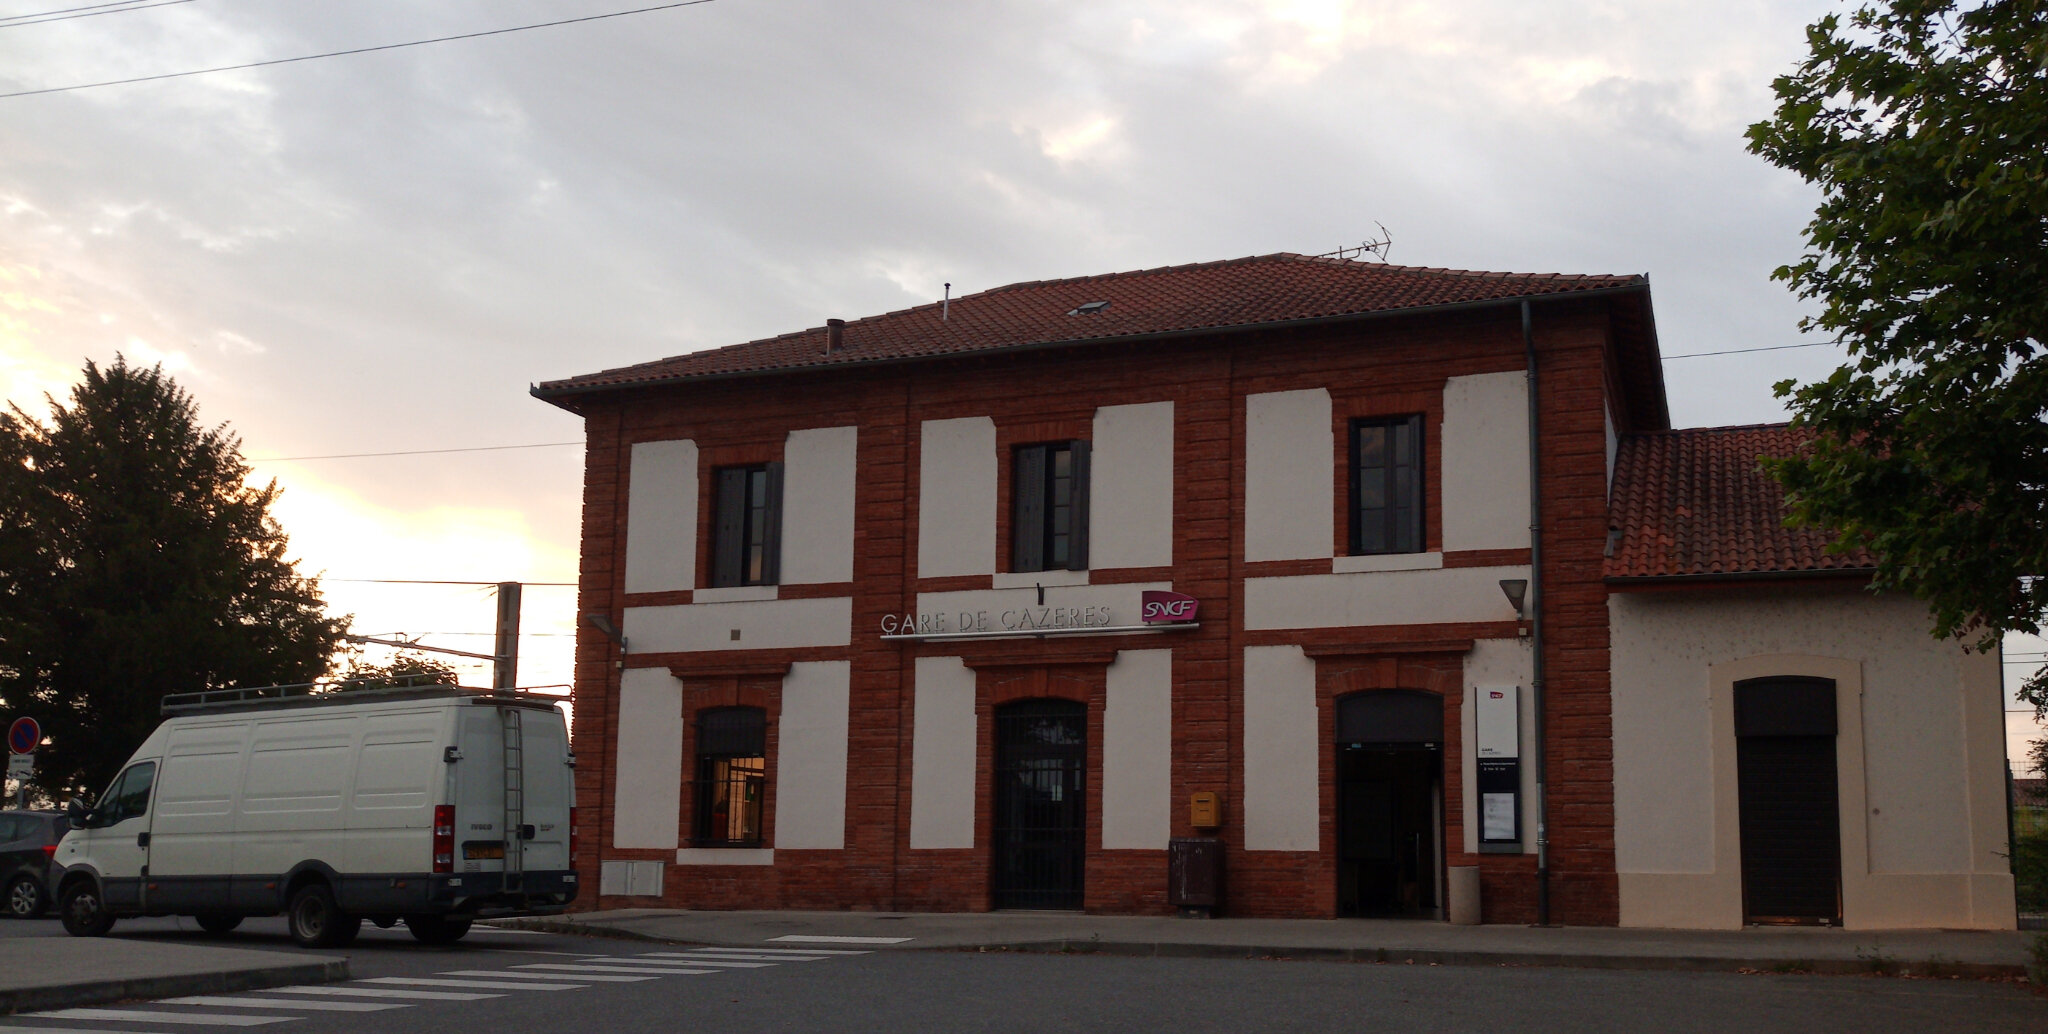 Cazères (Haute-Garonne - 31)